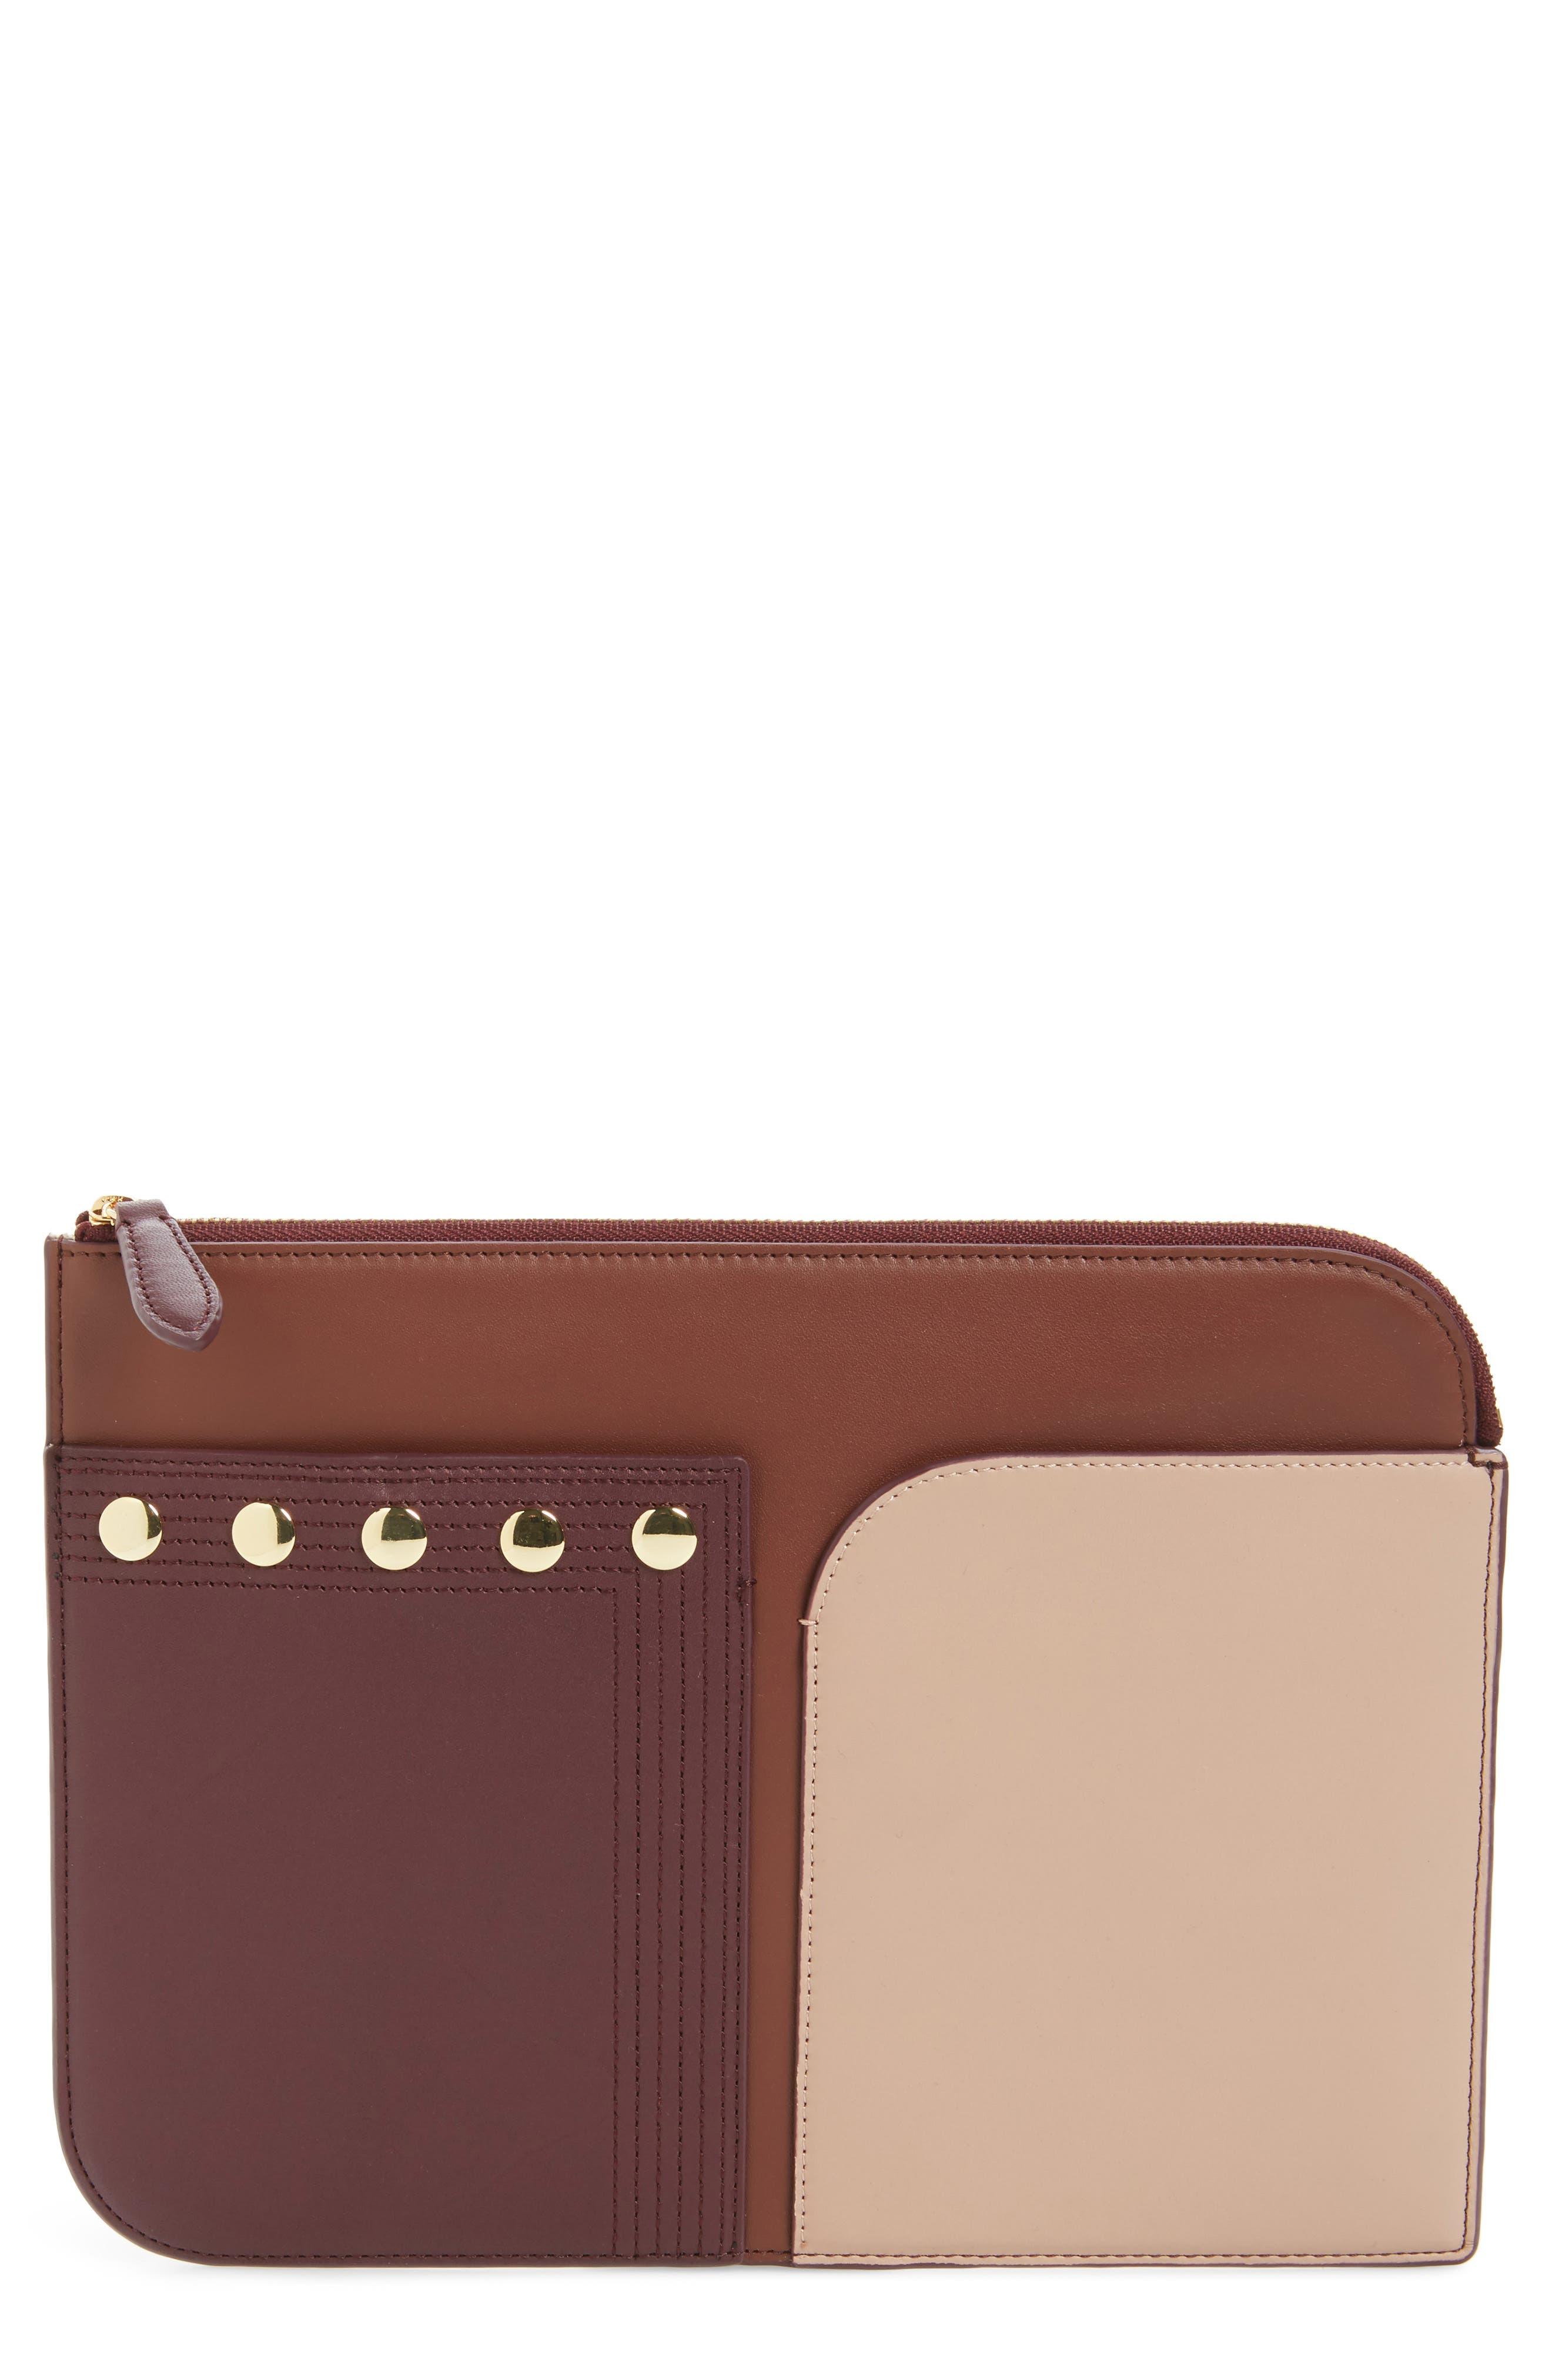 Diane von Furstenberg Large Colorblock Leather Zip Pouch